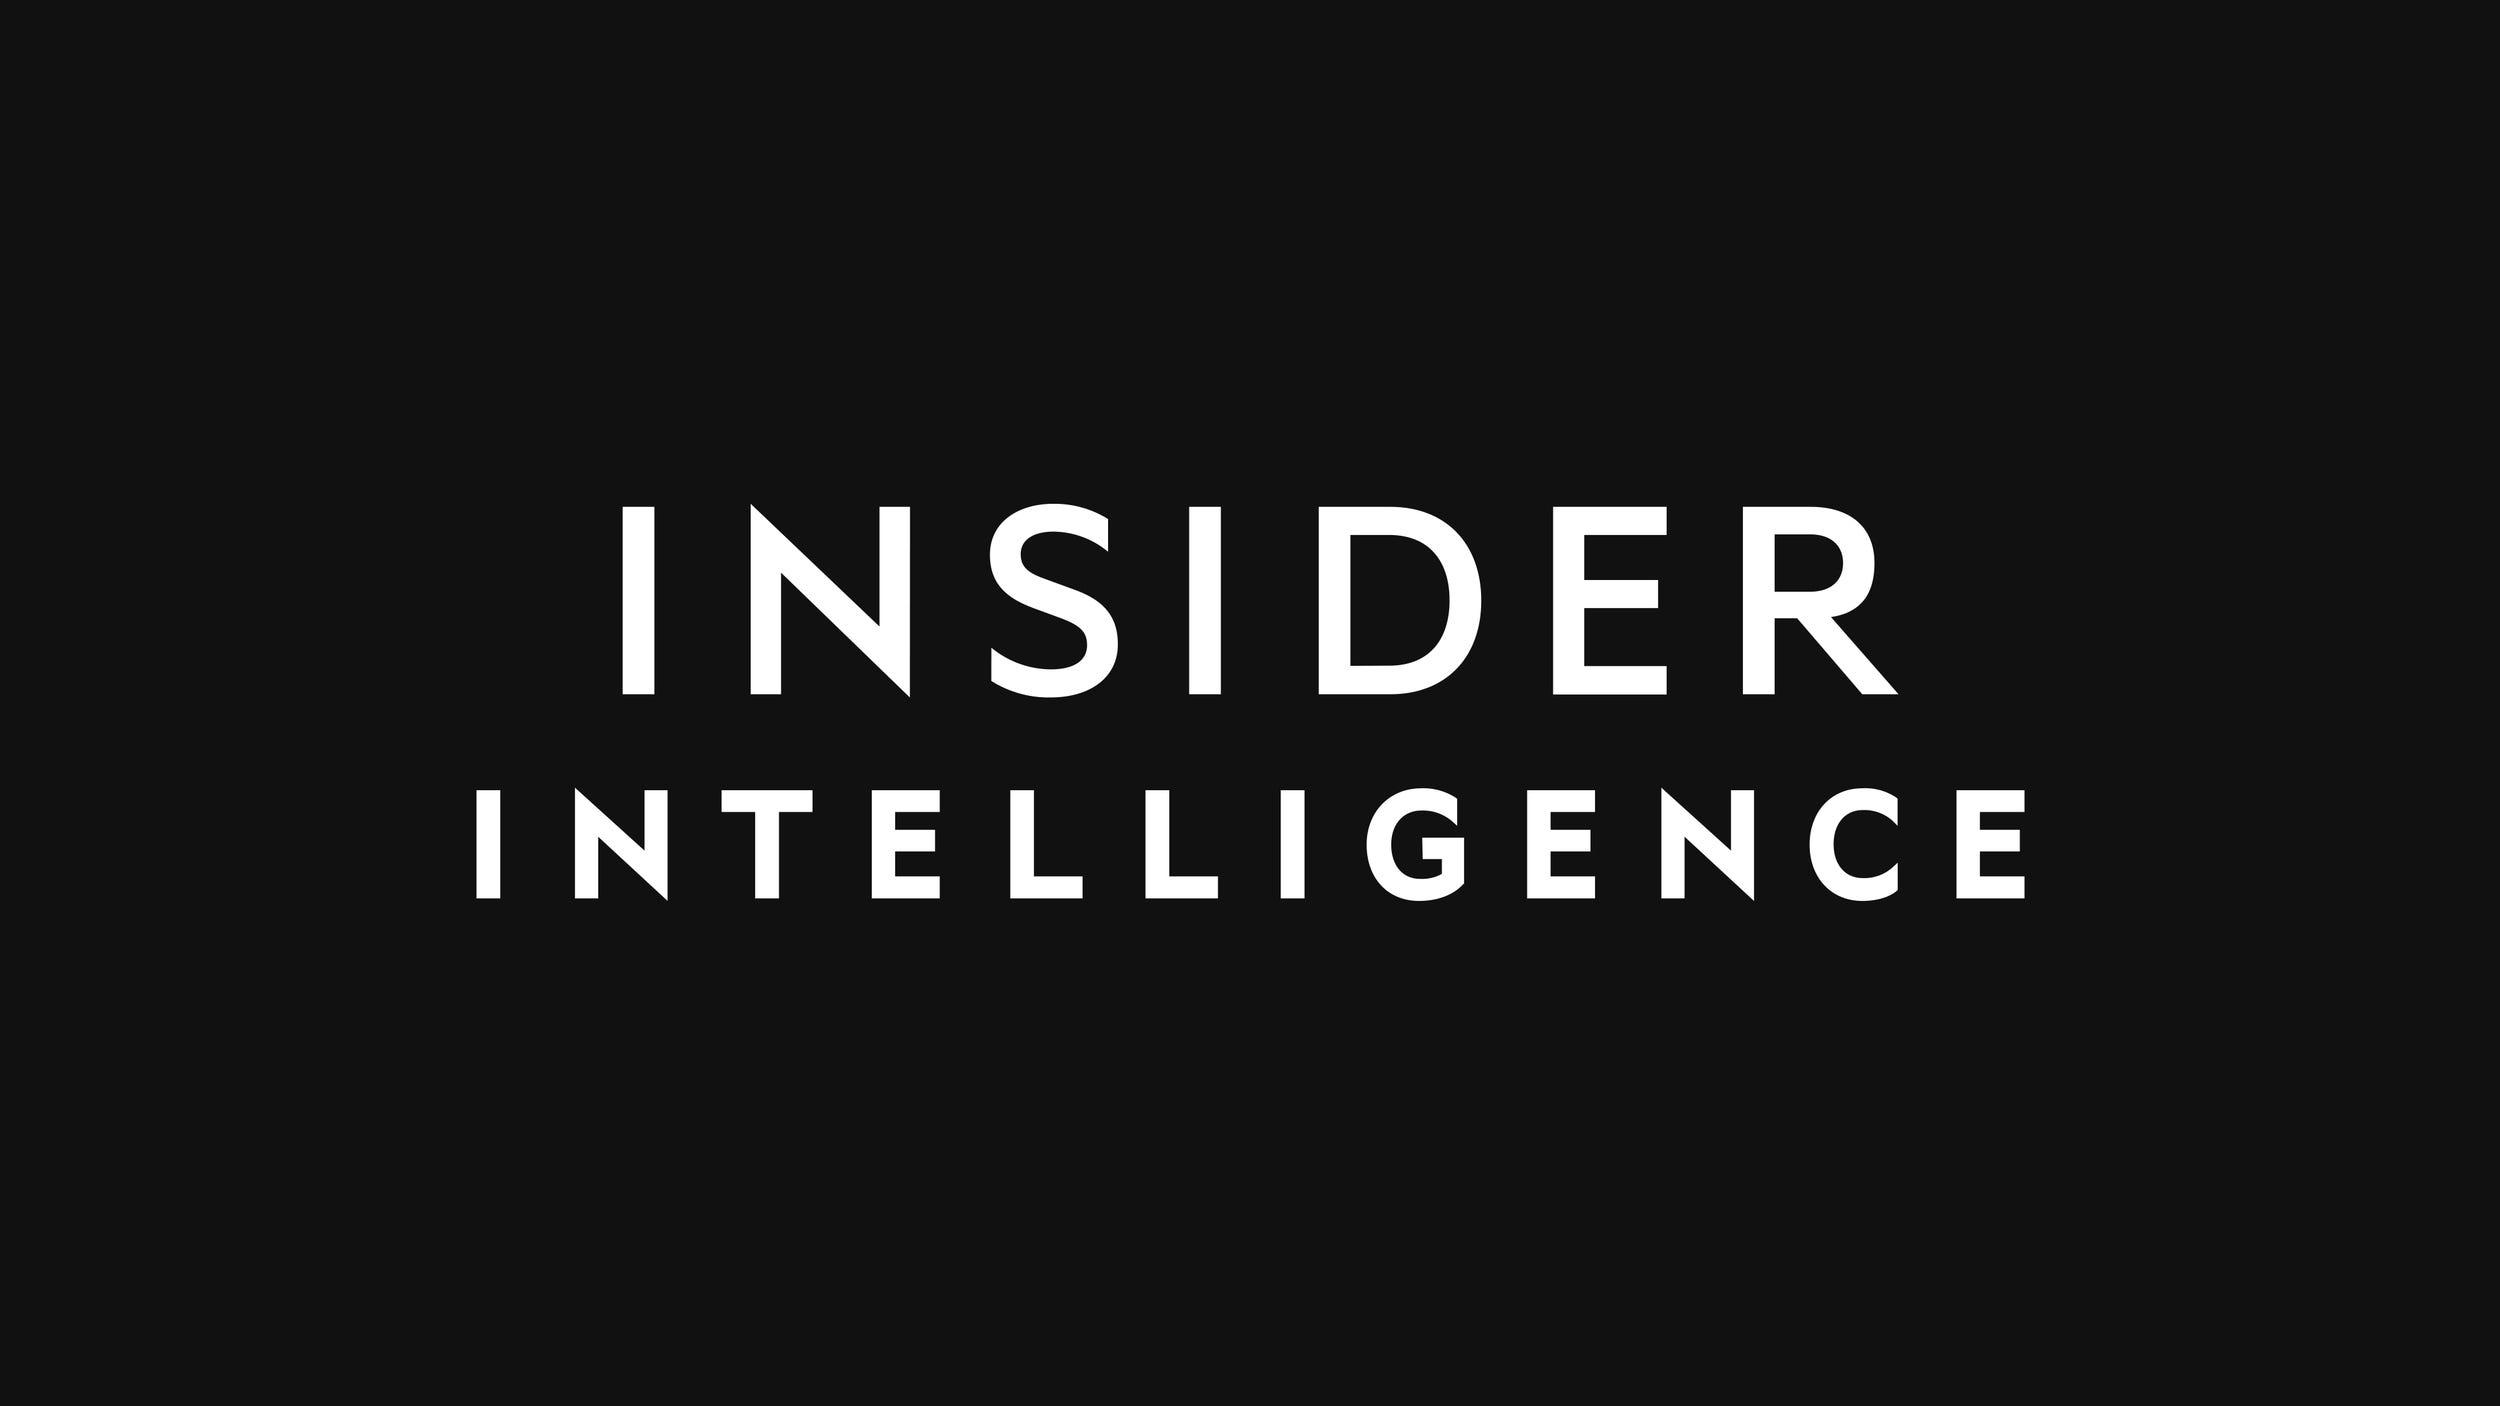 「Business Insider Intelligence」と「eMarketer」が統合し「Insider Intelligence」へリブランド